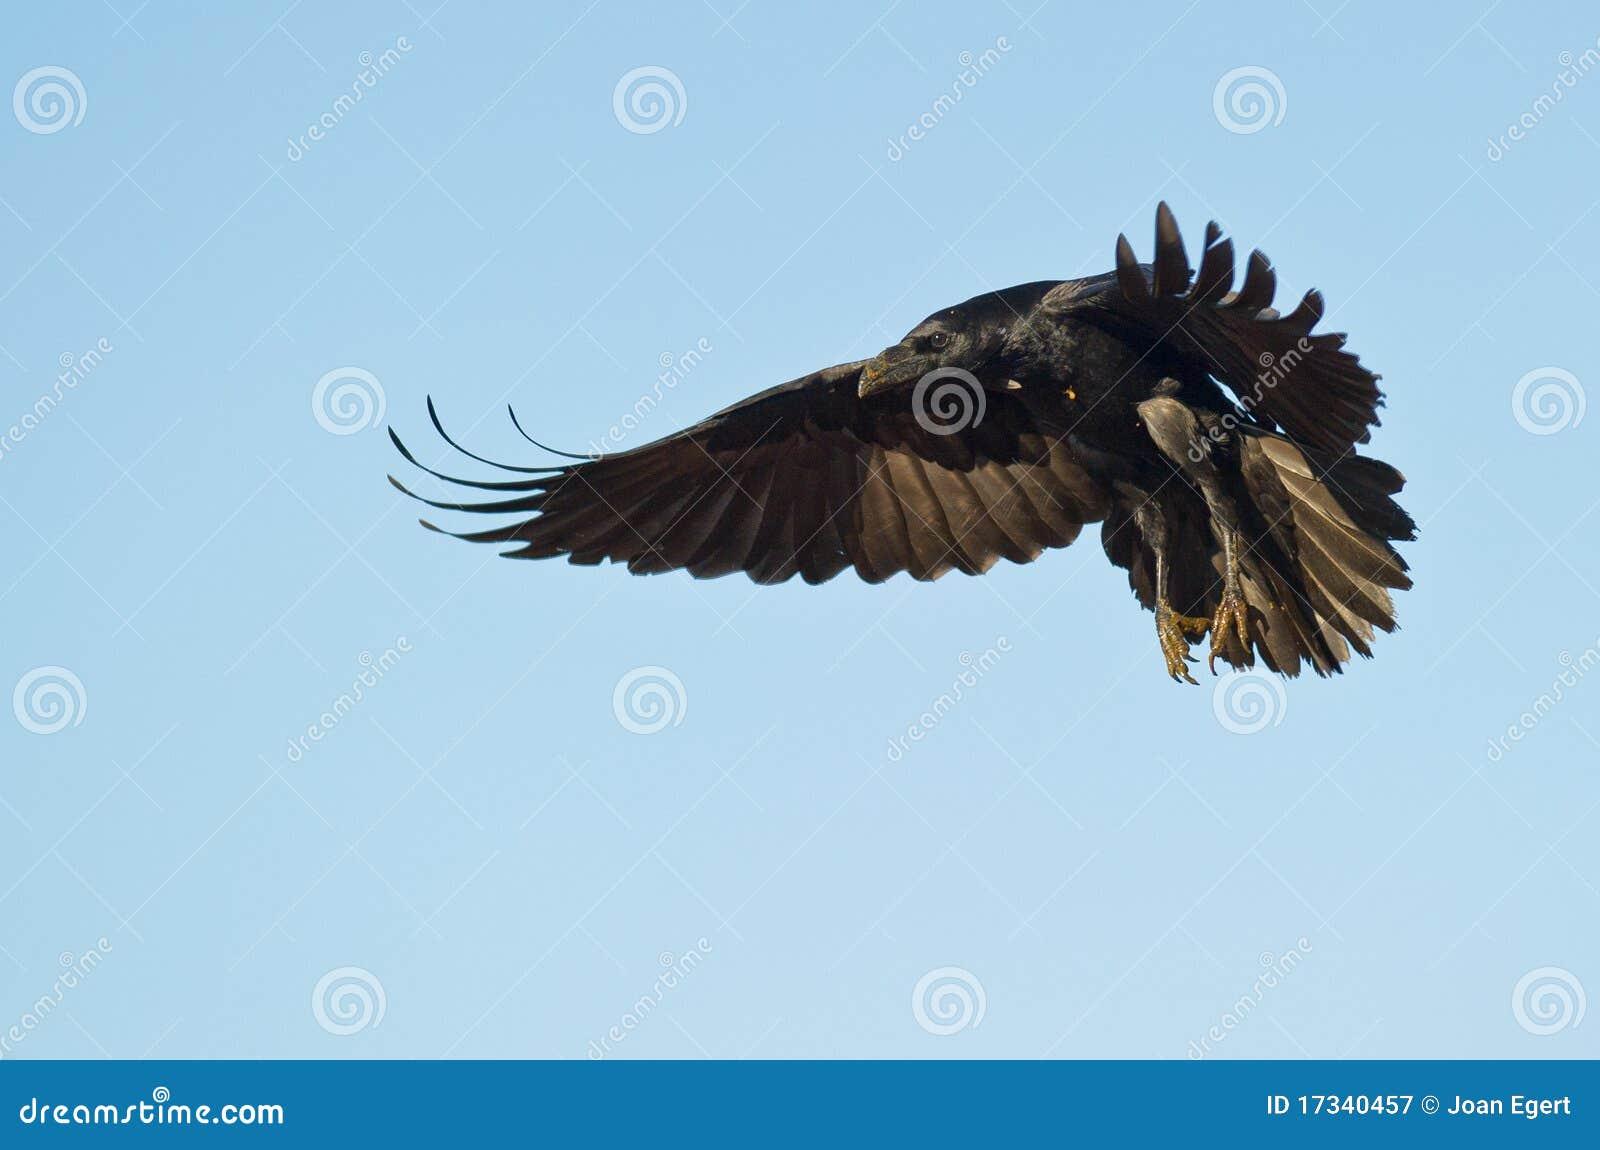 A landing Common Raven